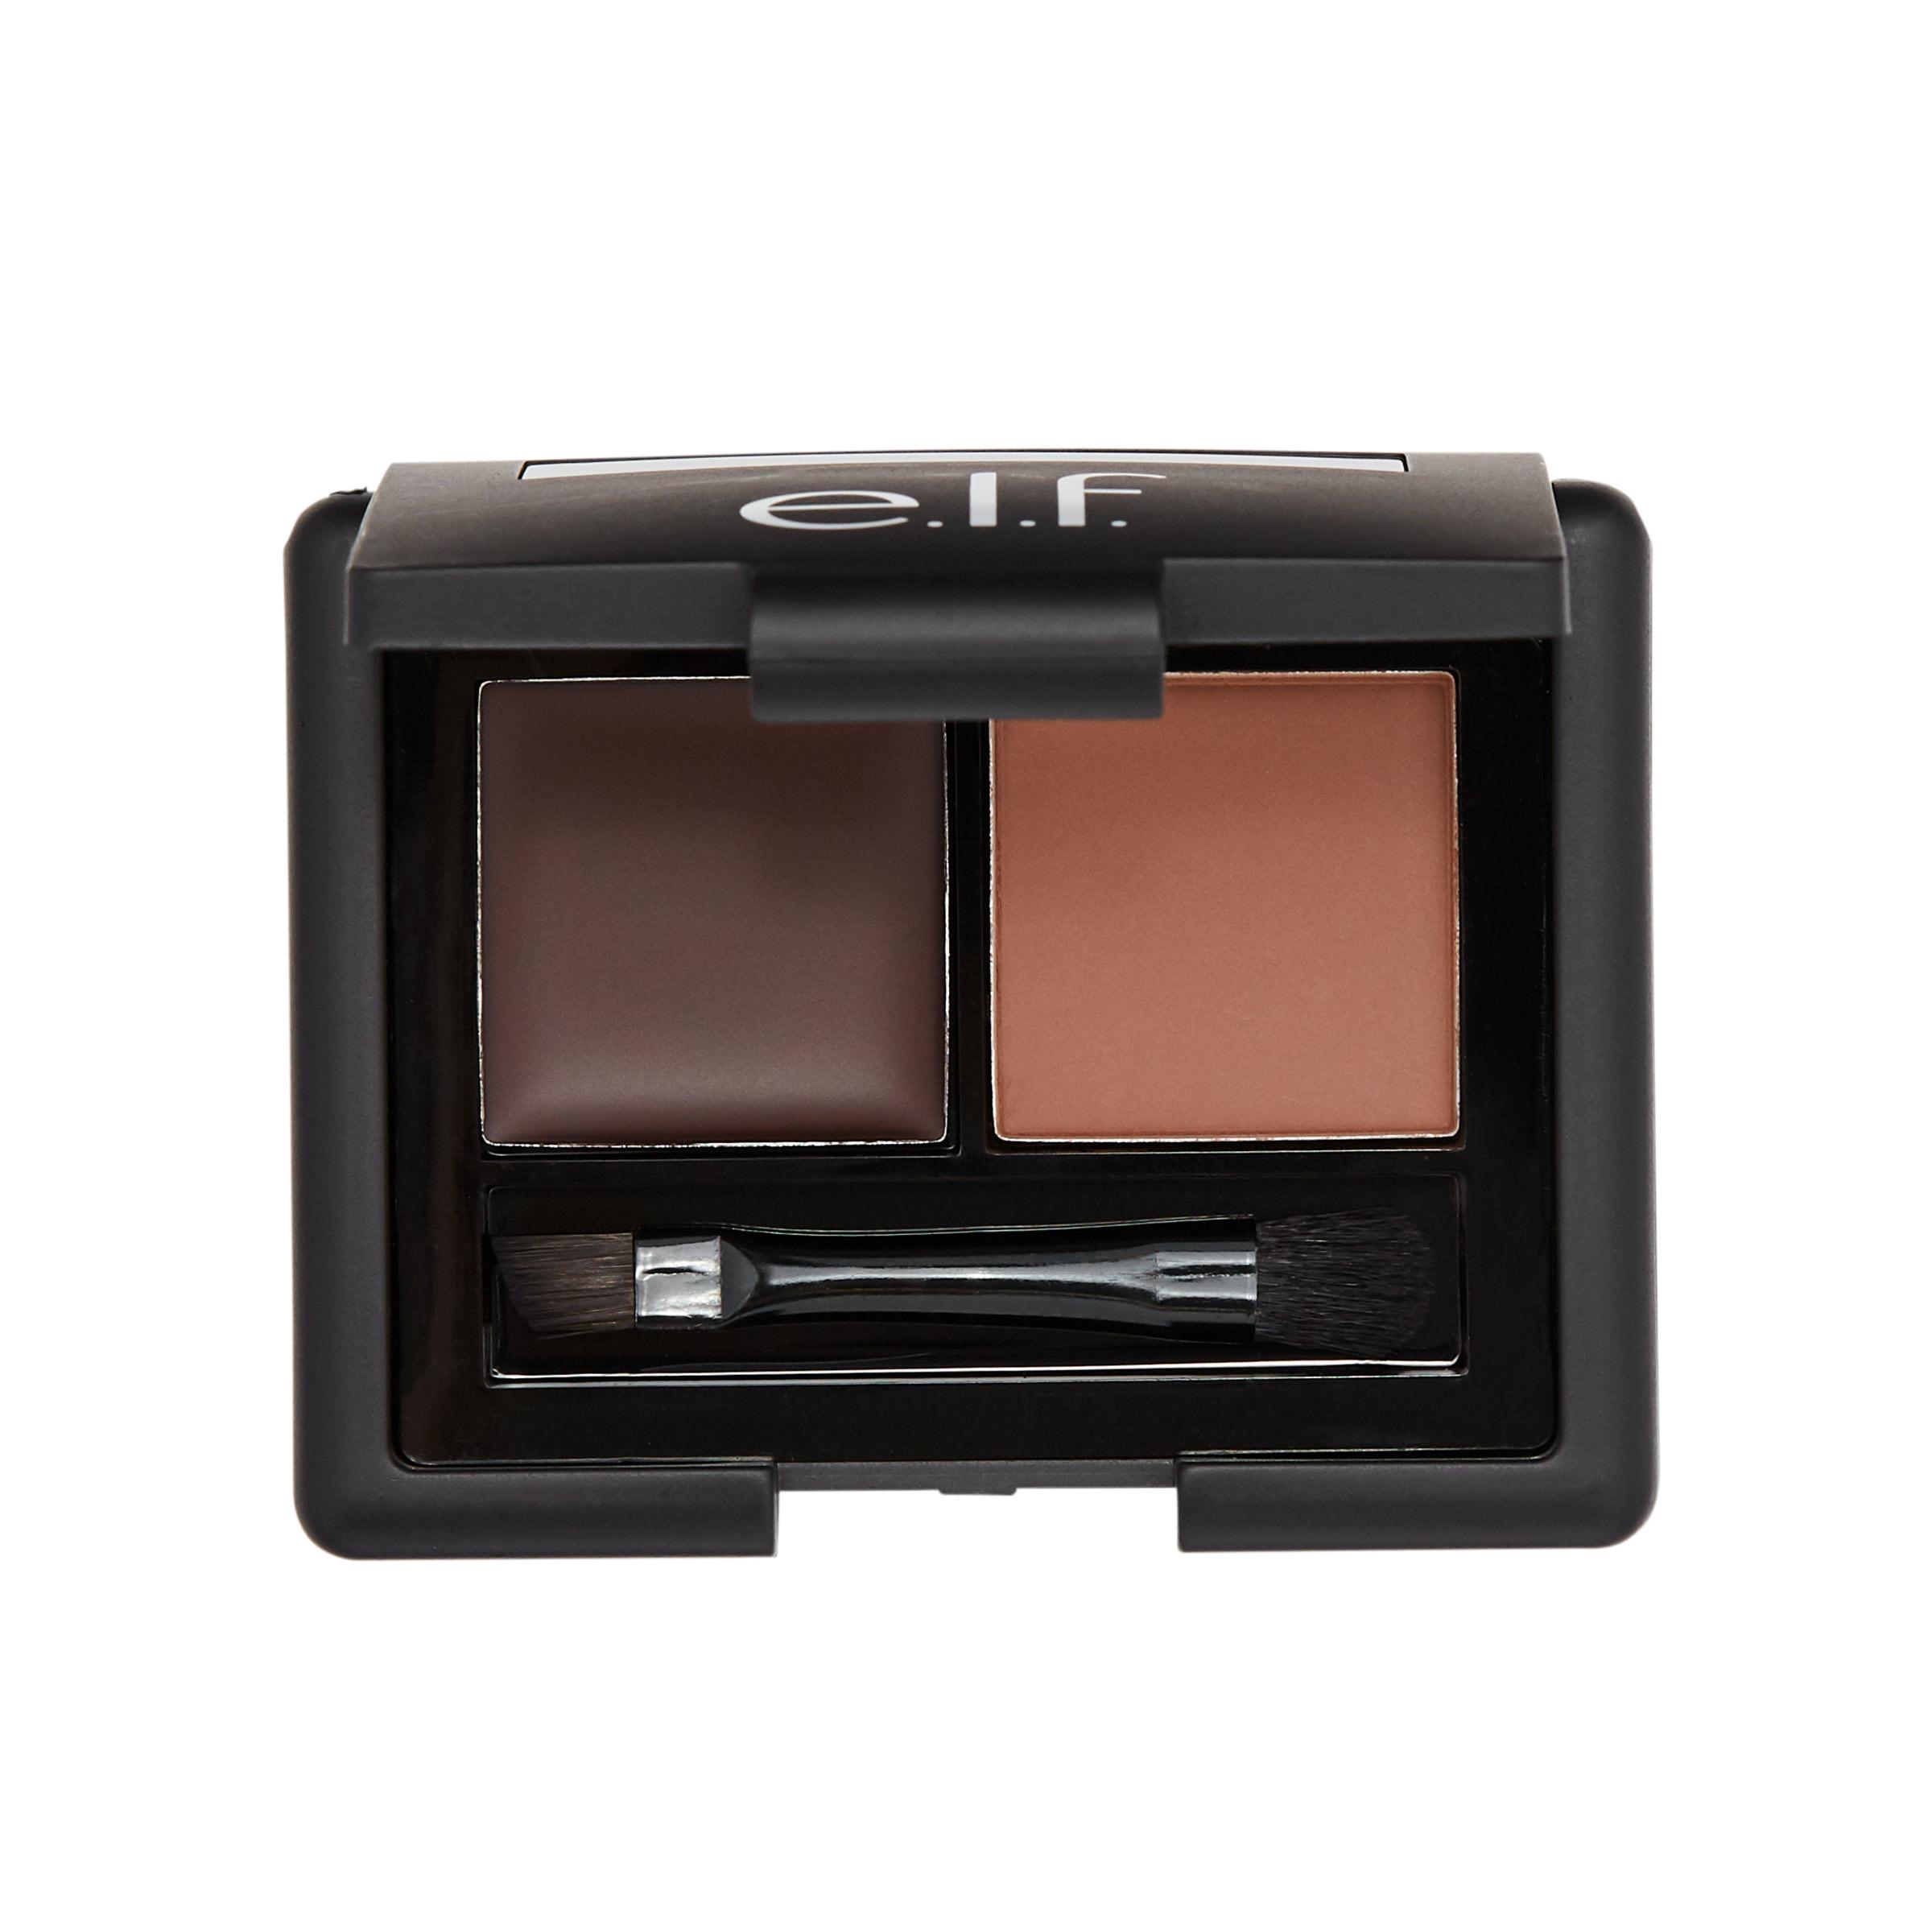 Elf Gel Powder Eyebrow Duo Kit With Brush Medium Kuas Mascara Shadow Anastasia